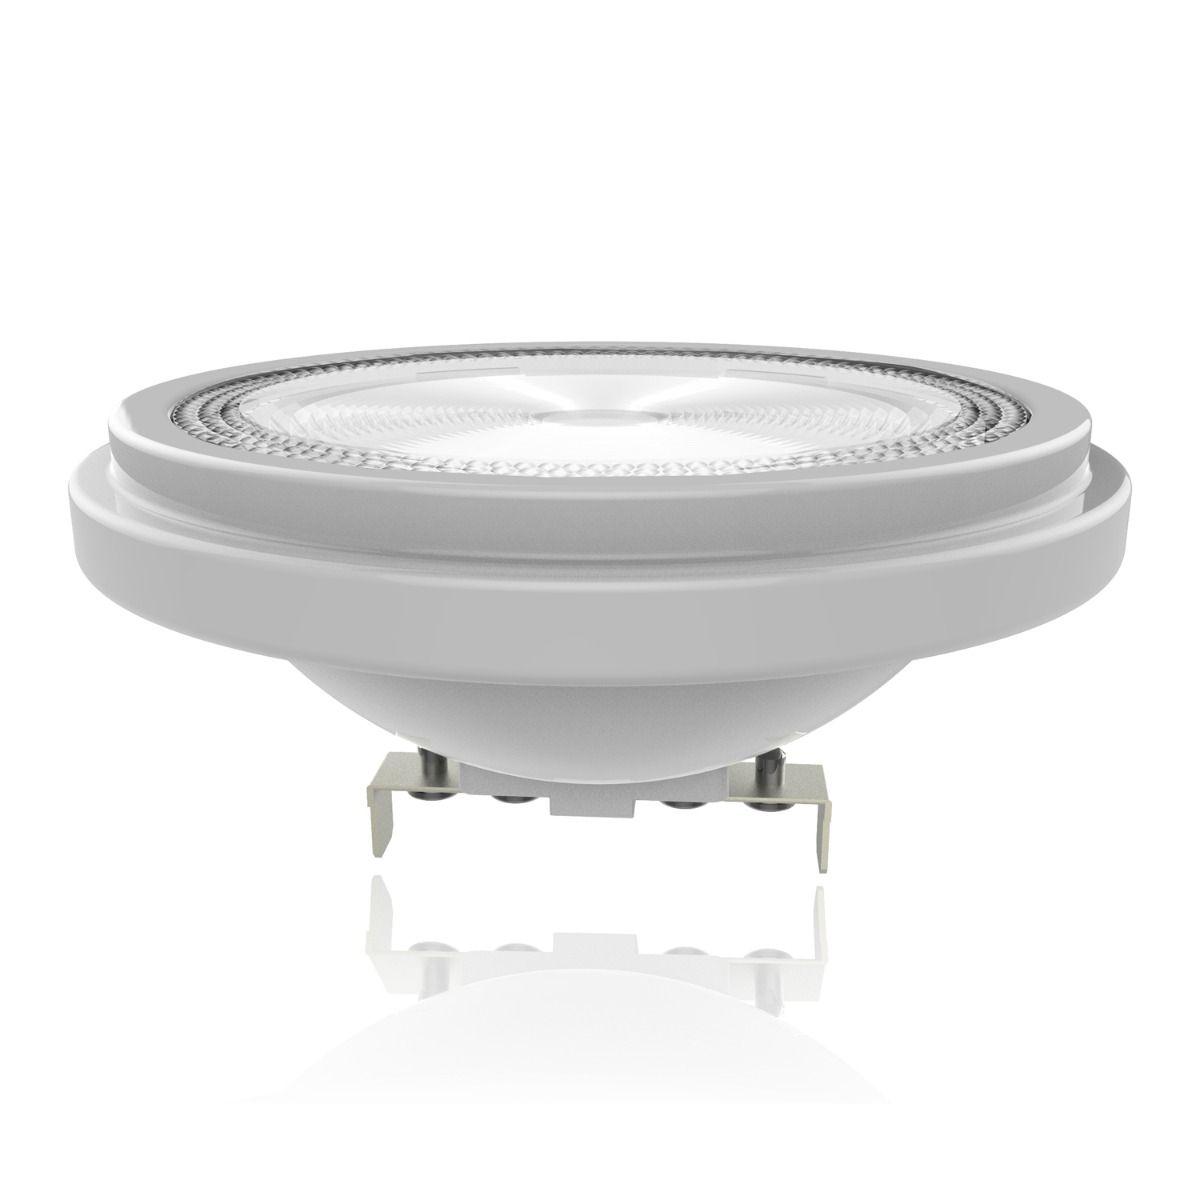 Noxion Lucent LED Spot AR111 G53 12V 11.5W 930 40D | Dimbaar - Hoogste Kleurweergave - Vervanger voor 75W